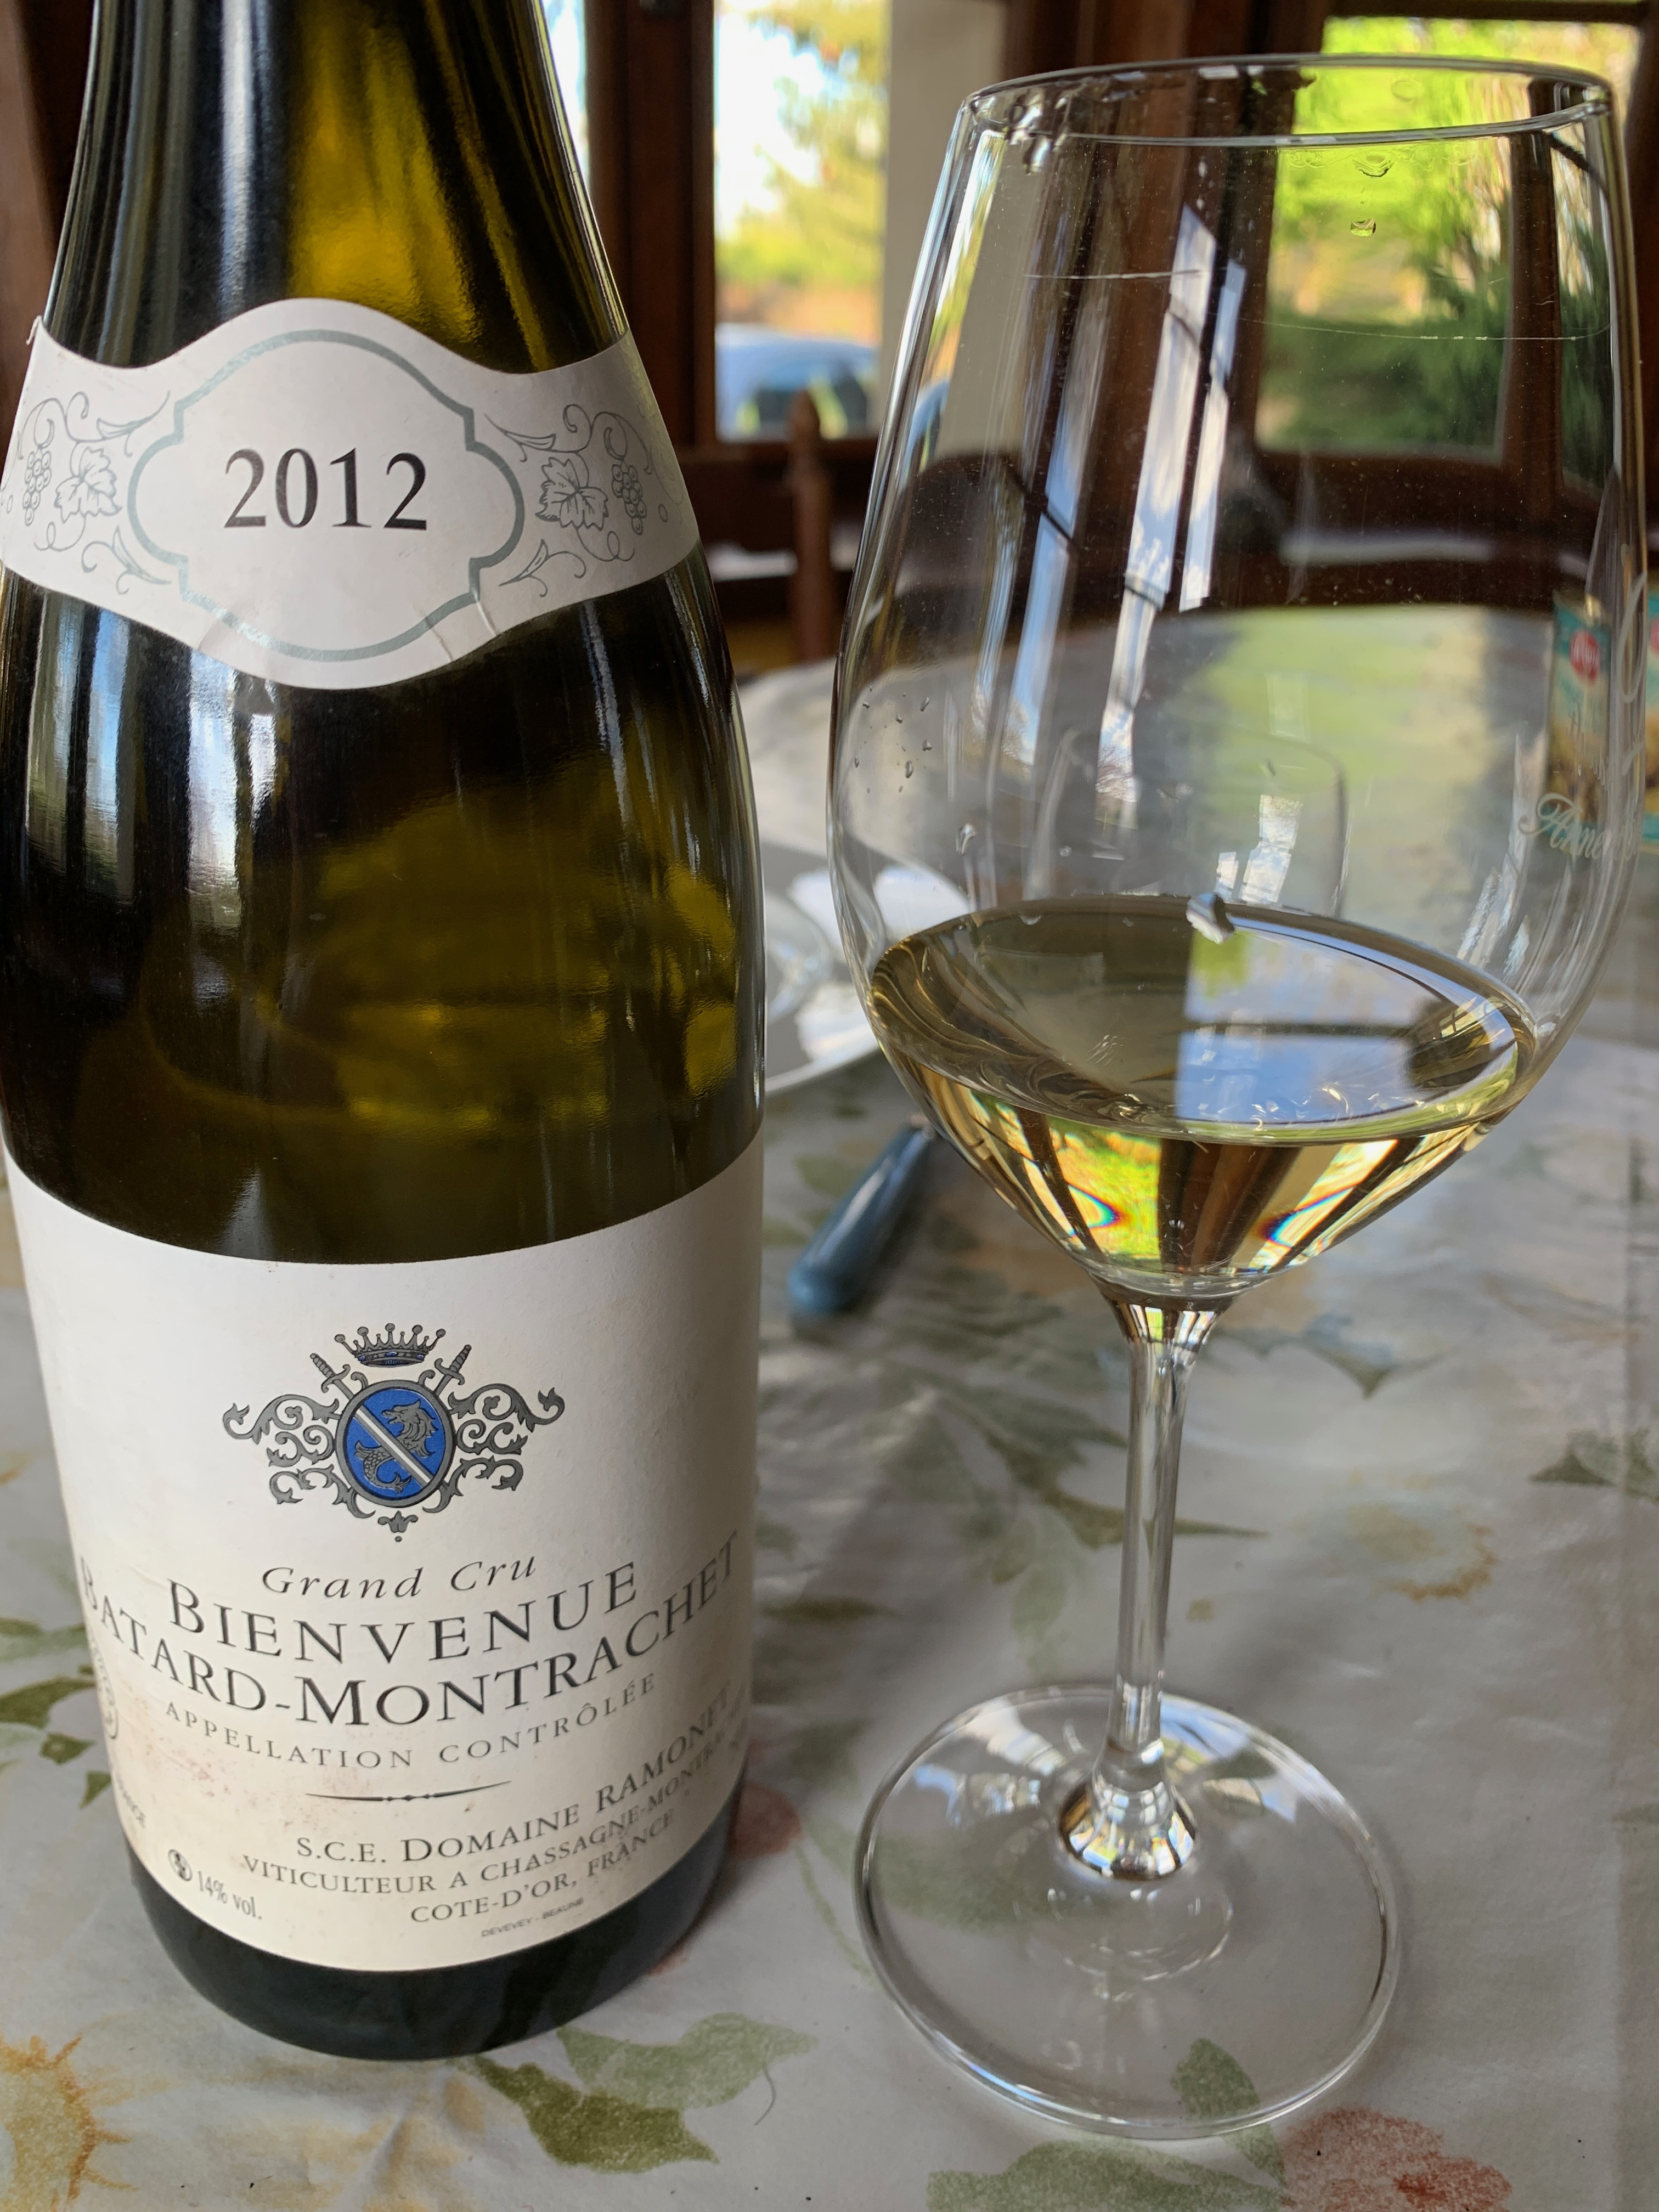 Bienvenue Batard Montrachet 2012